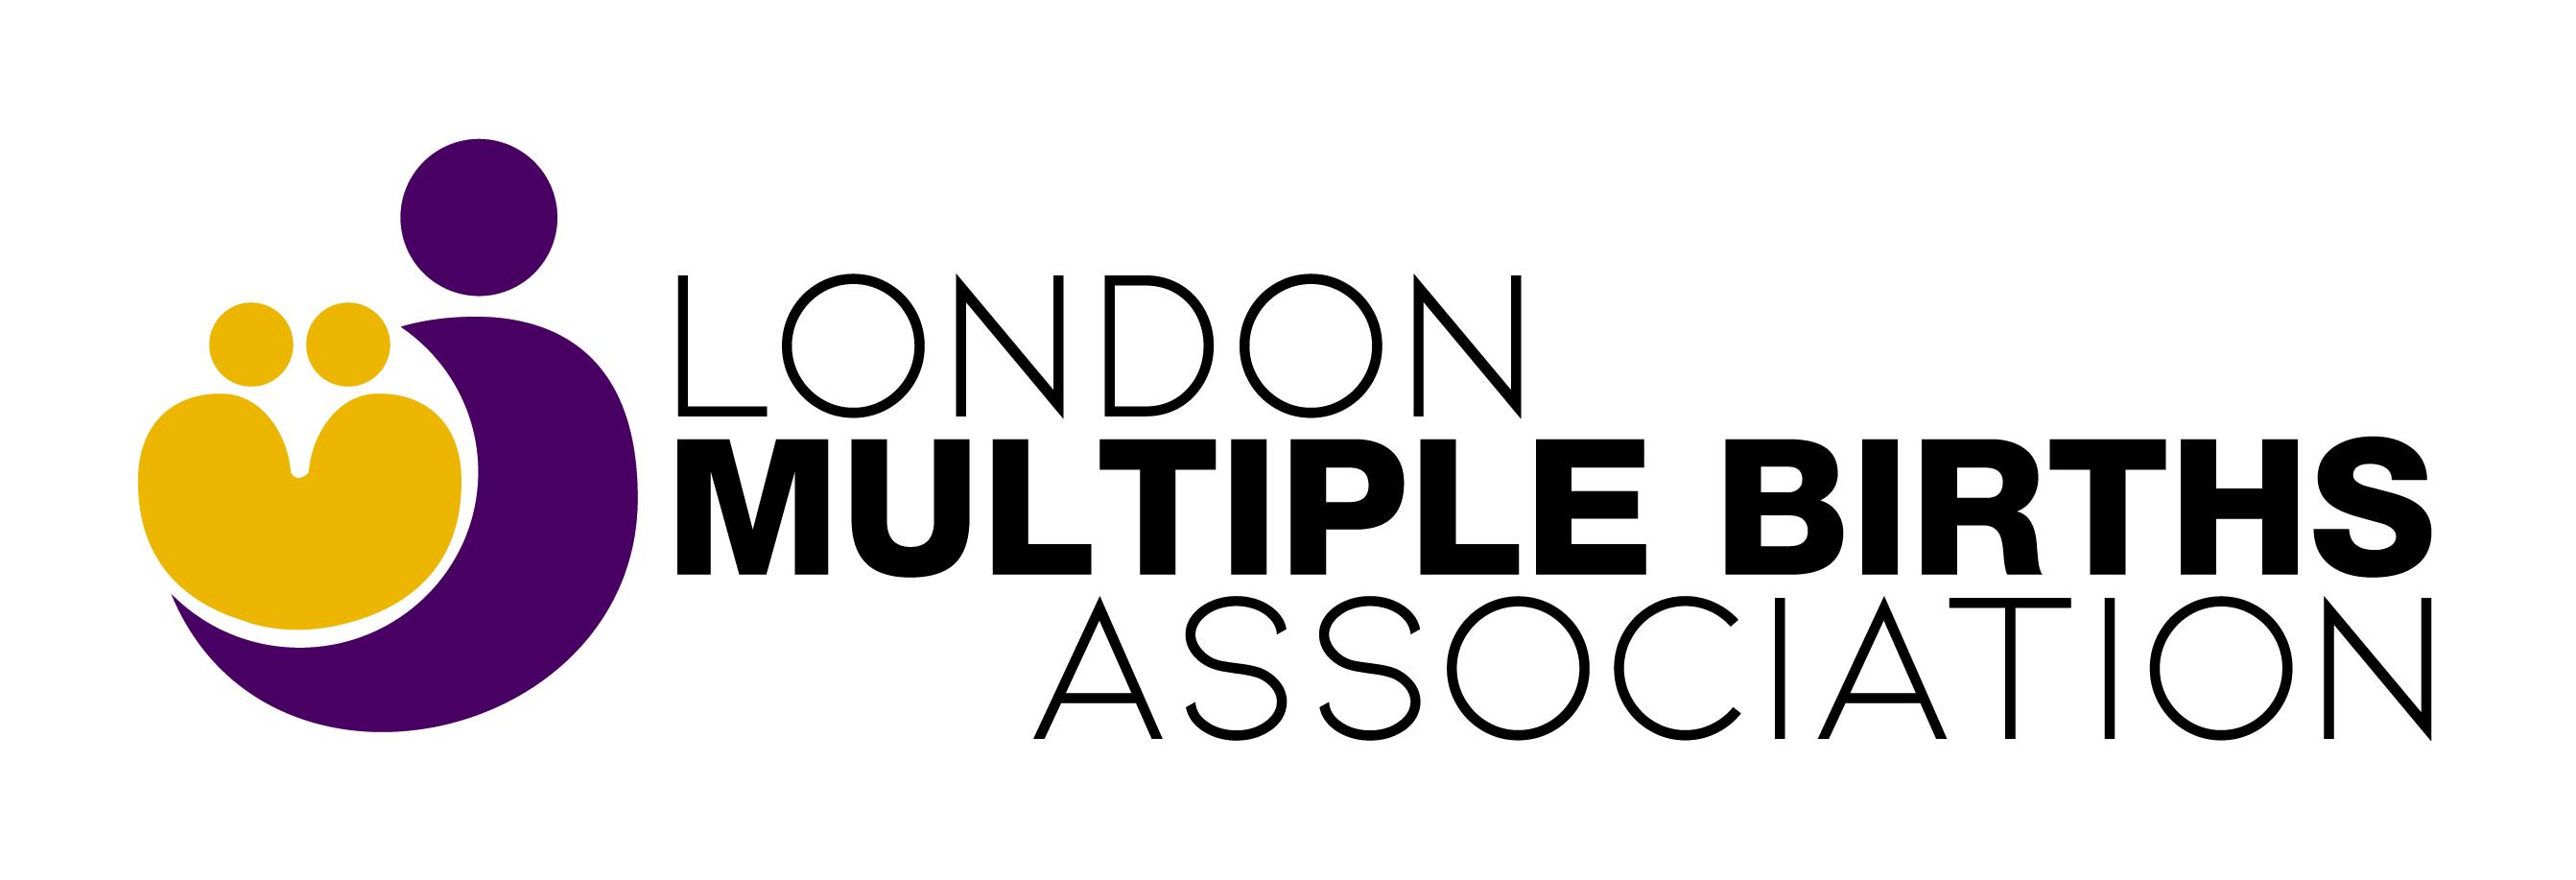 London Multiples